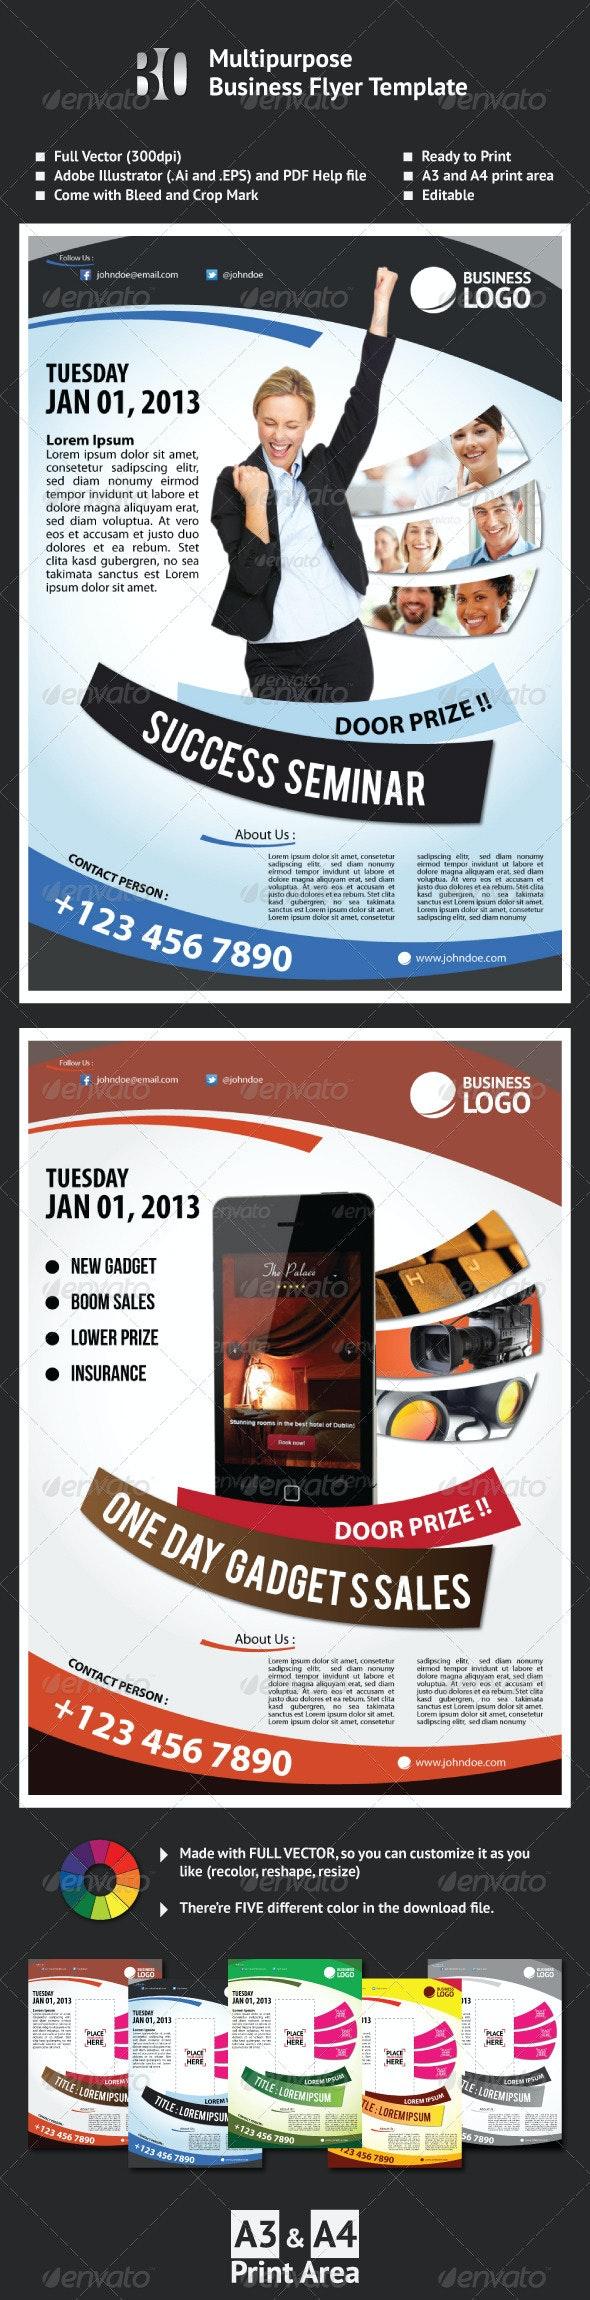 Multipurpose Business Flyer Template - Corporate Flyers